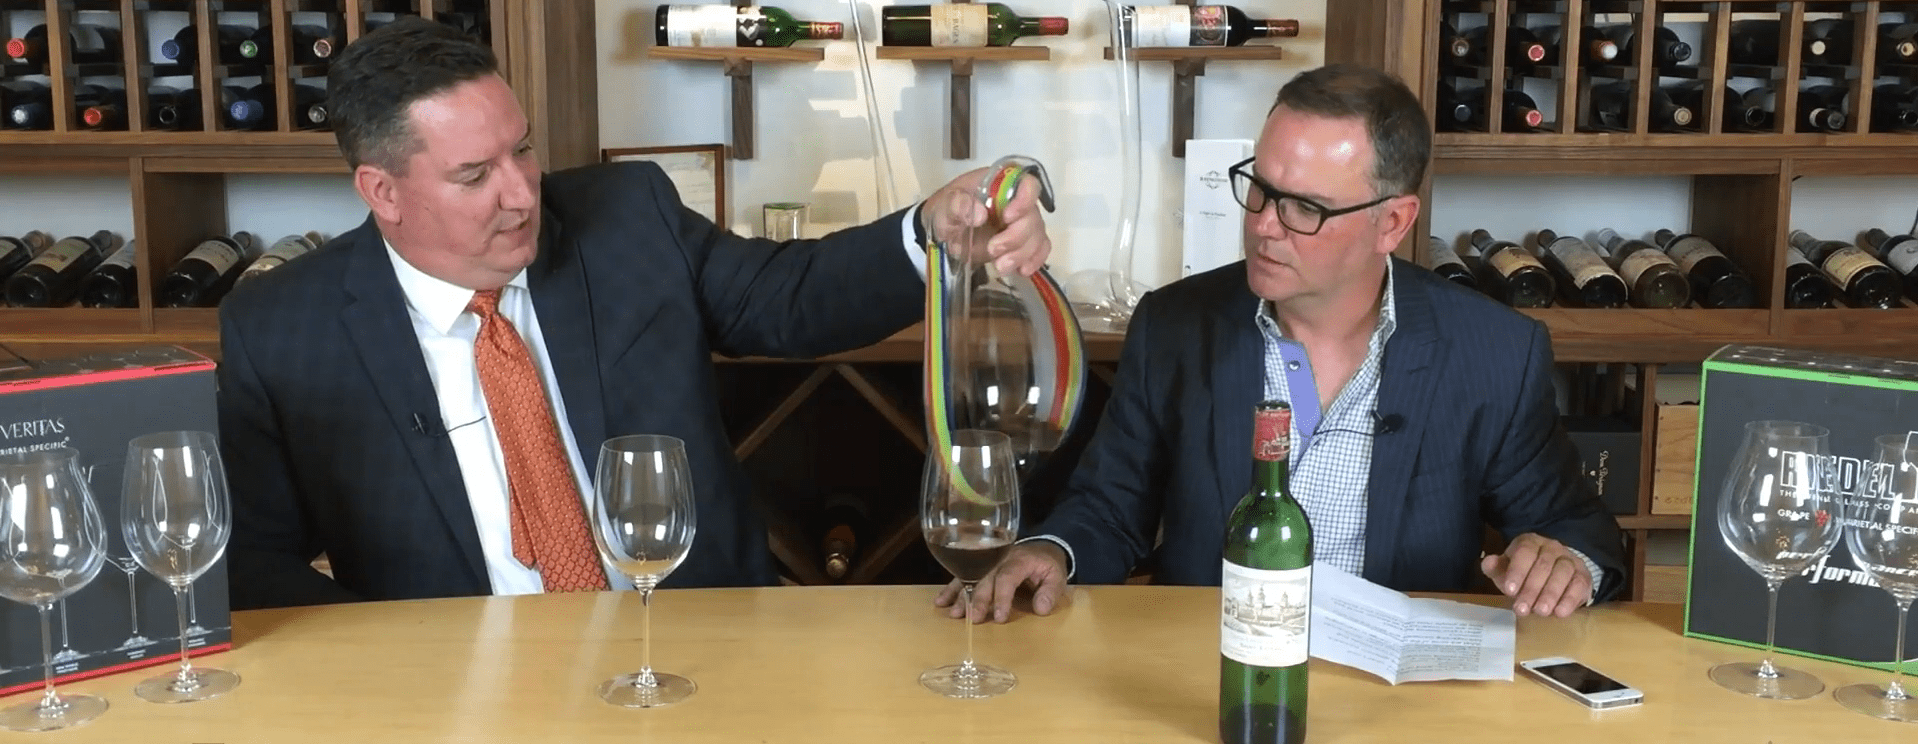 Behind Fine Wine | Riedel's Stewart Risto and Warren Porter Discuss Wine Stemware and Decanters